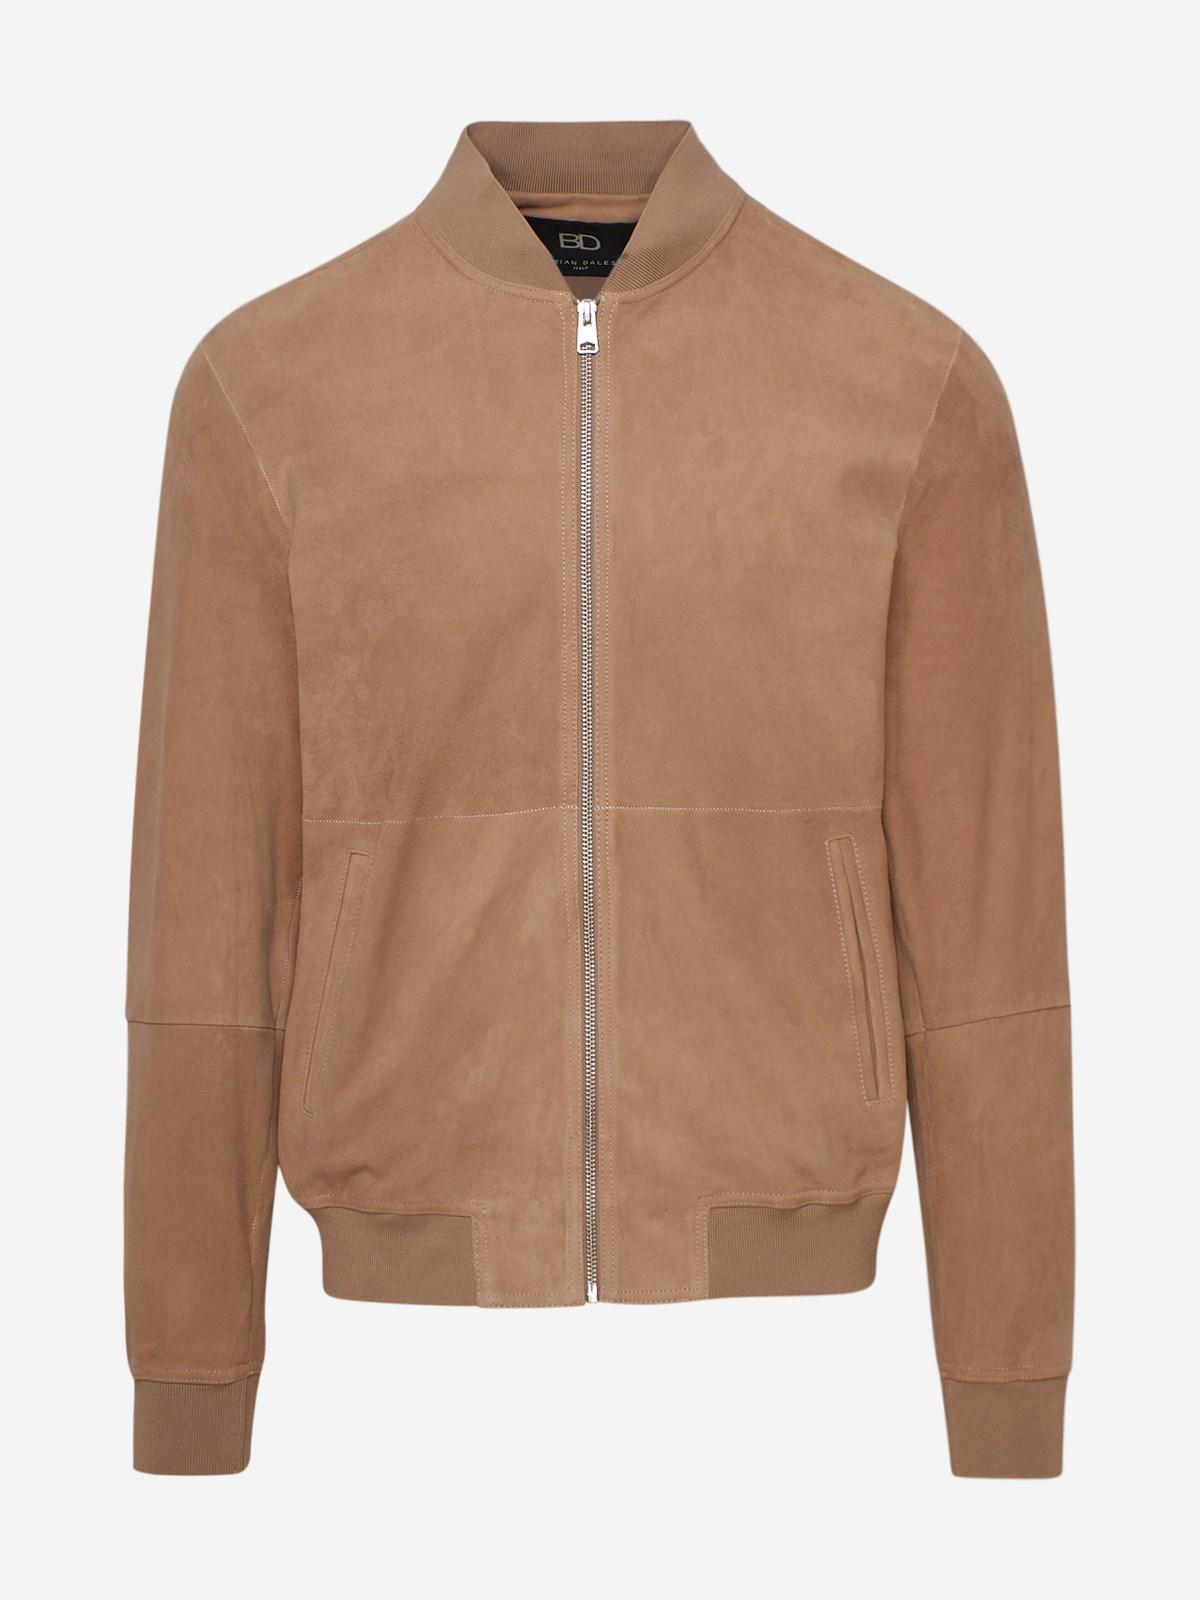 Brian Dales Bomber jackets BEIGE JACKET